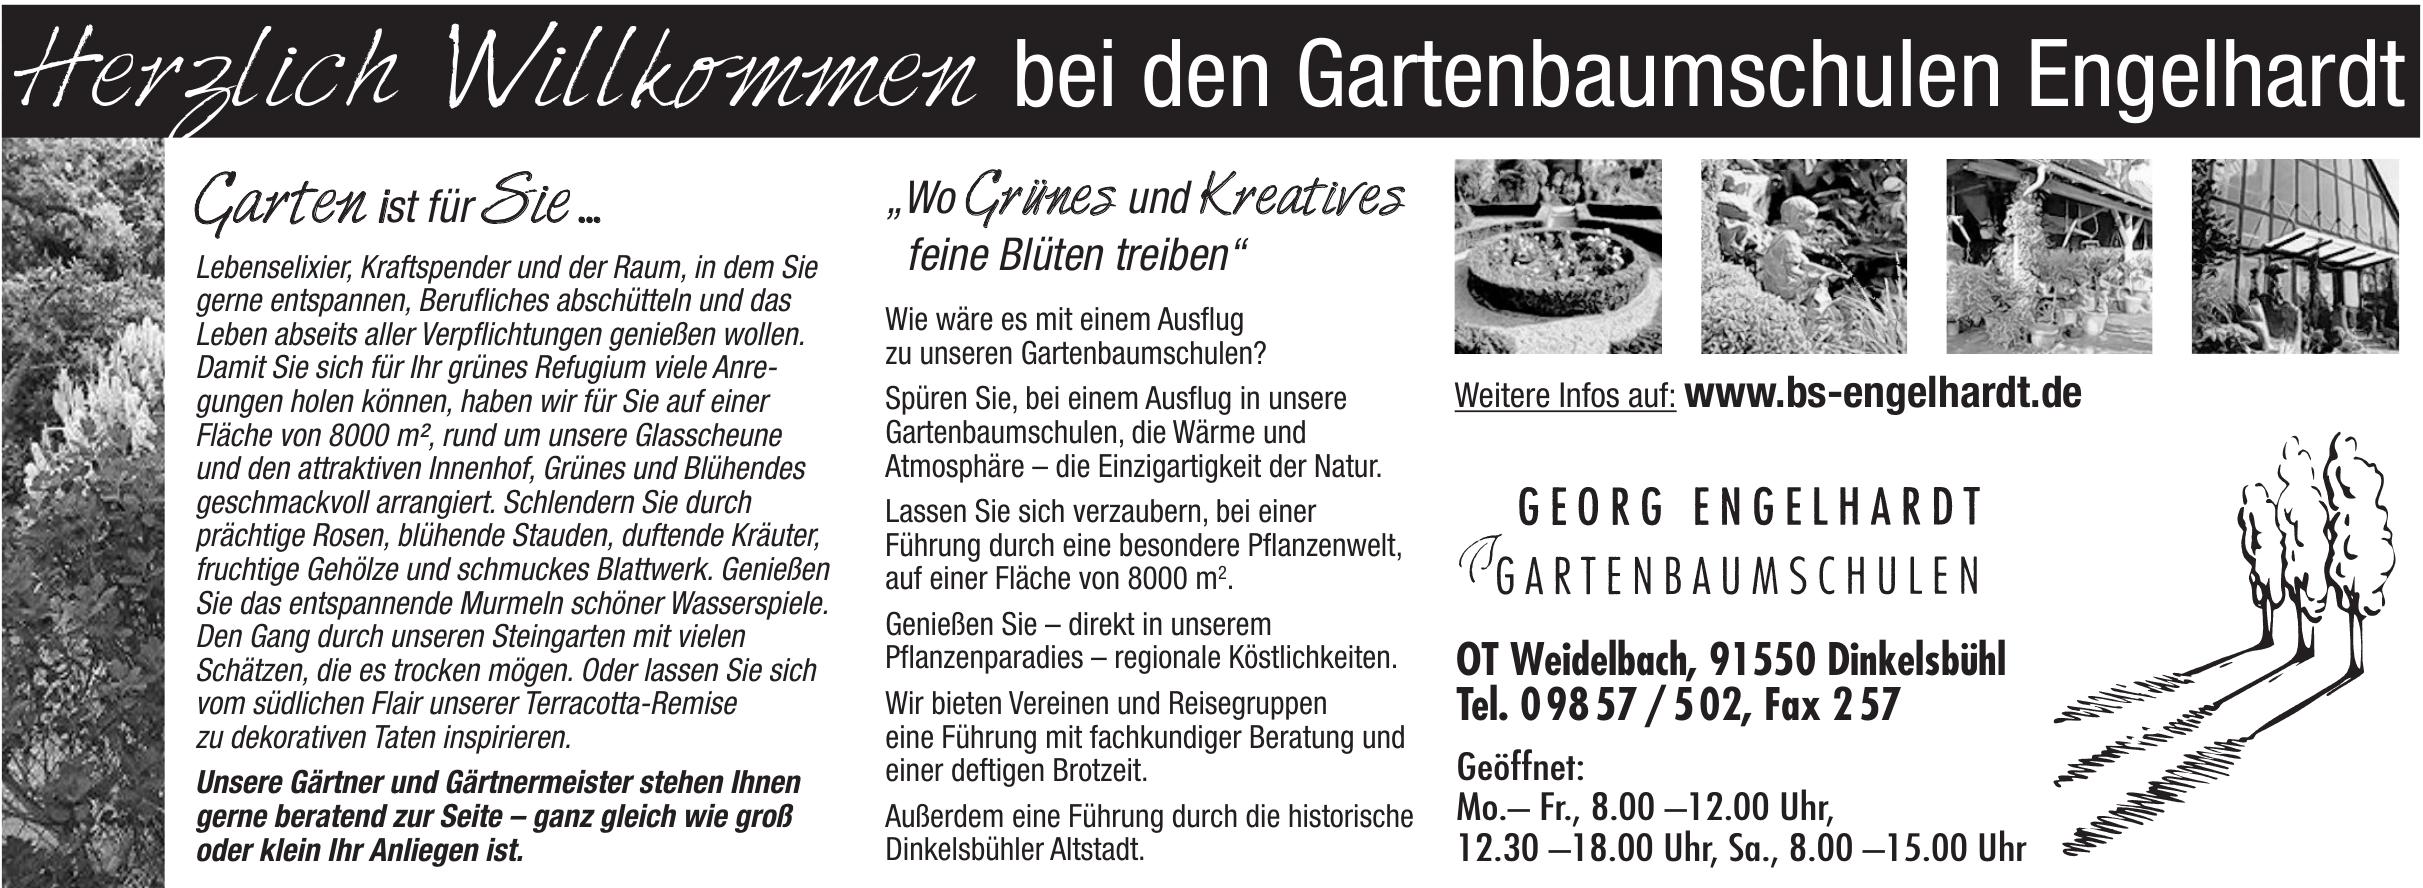 Georg Engelhardt Gartenbaumschulen